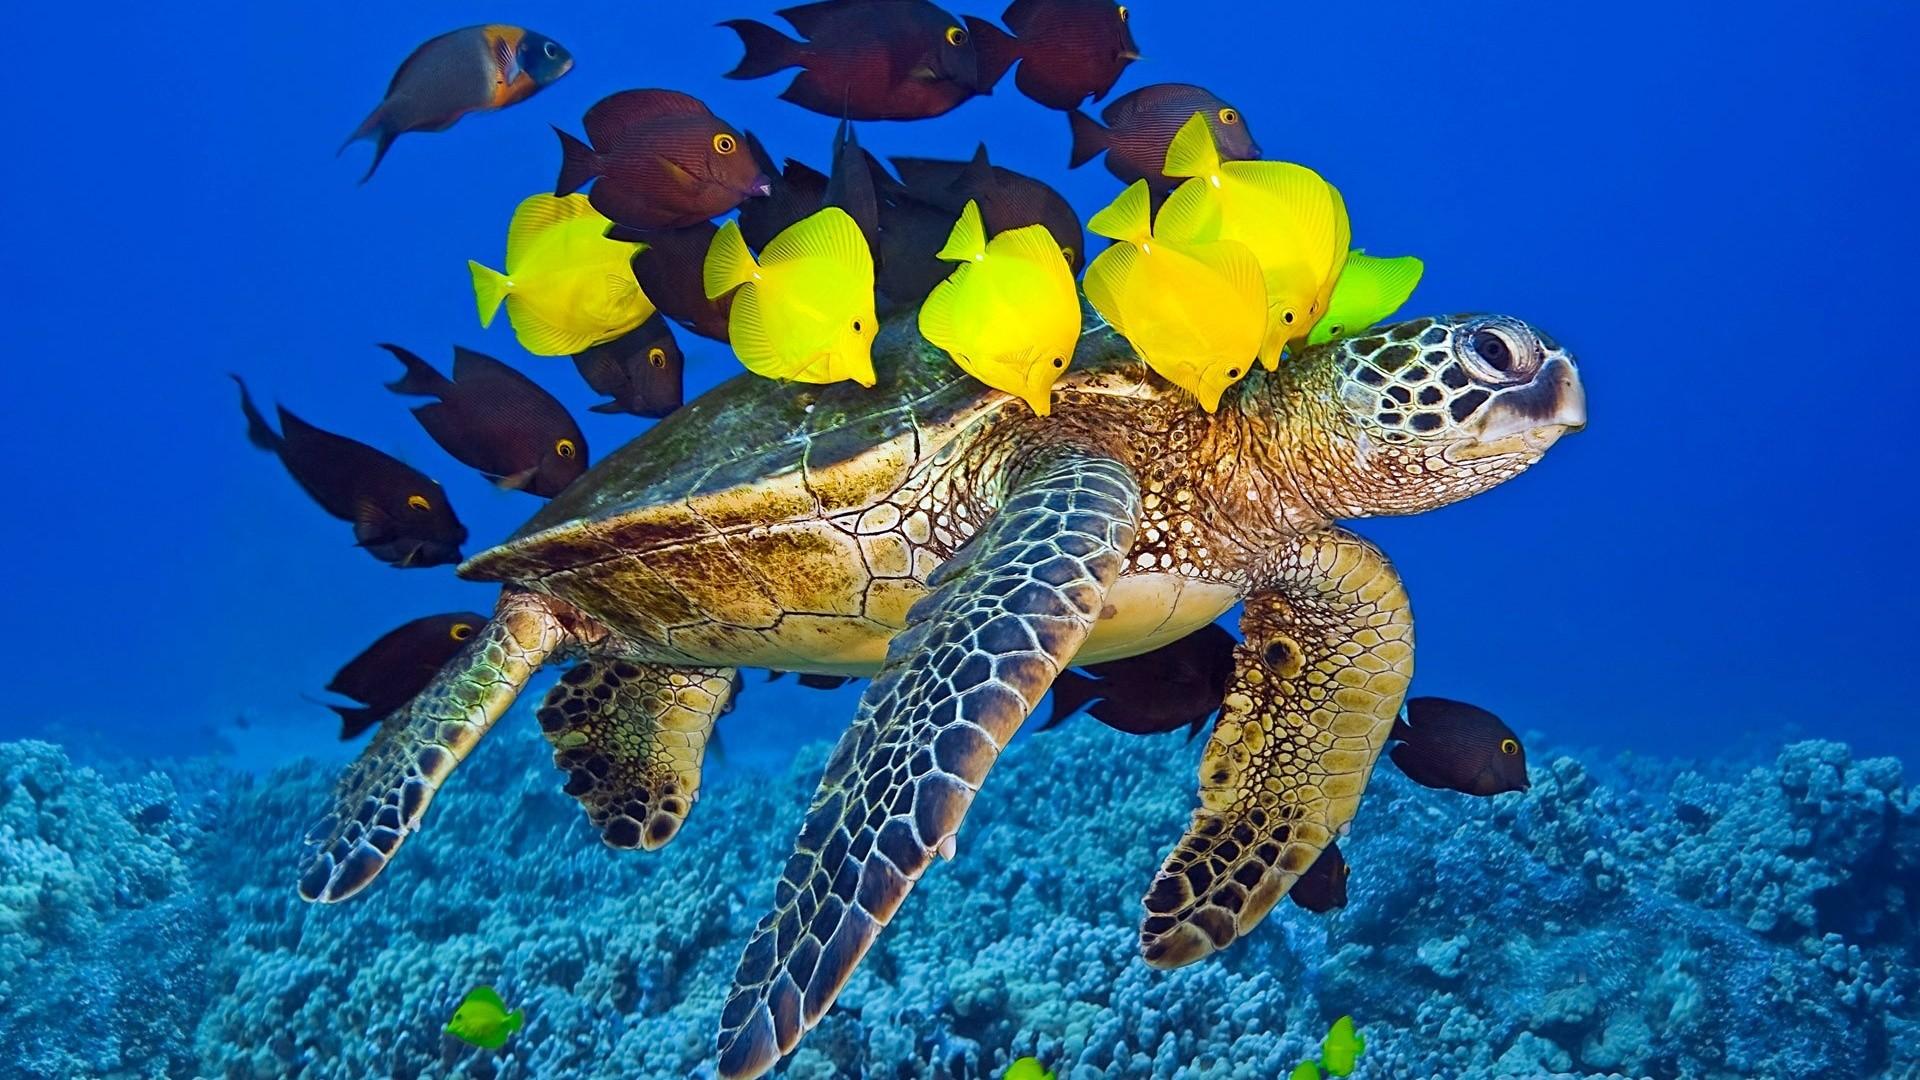 Sea turtle ocean underwater yellow and brown fish Wallpaper, Desktop .